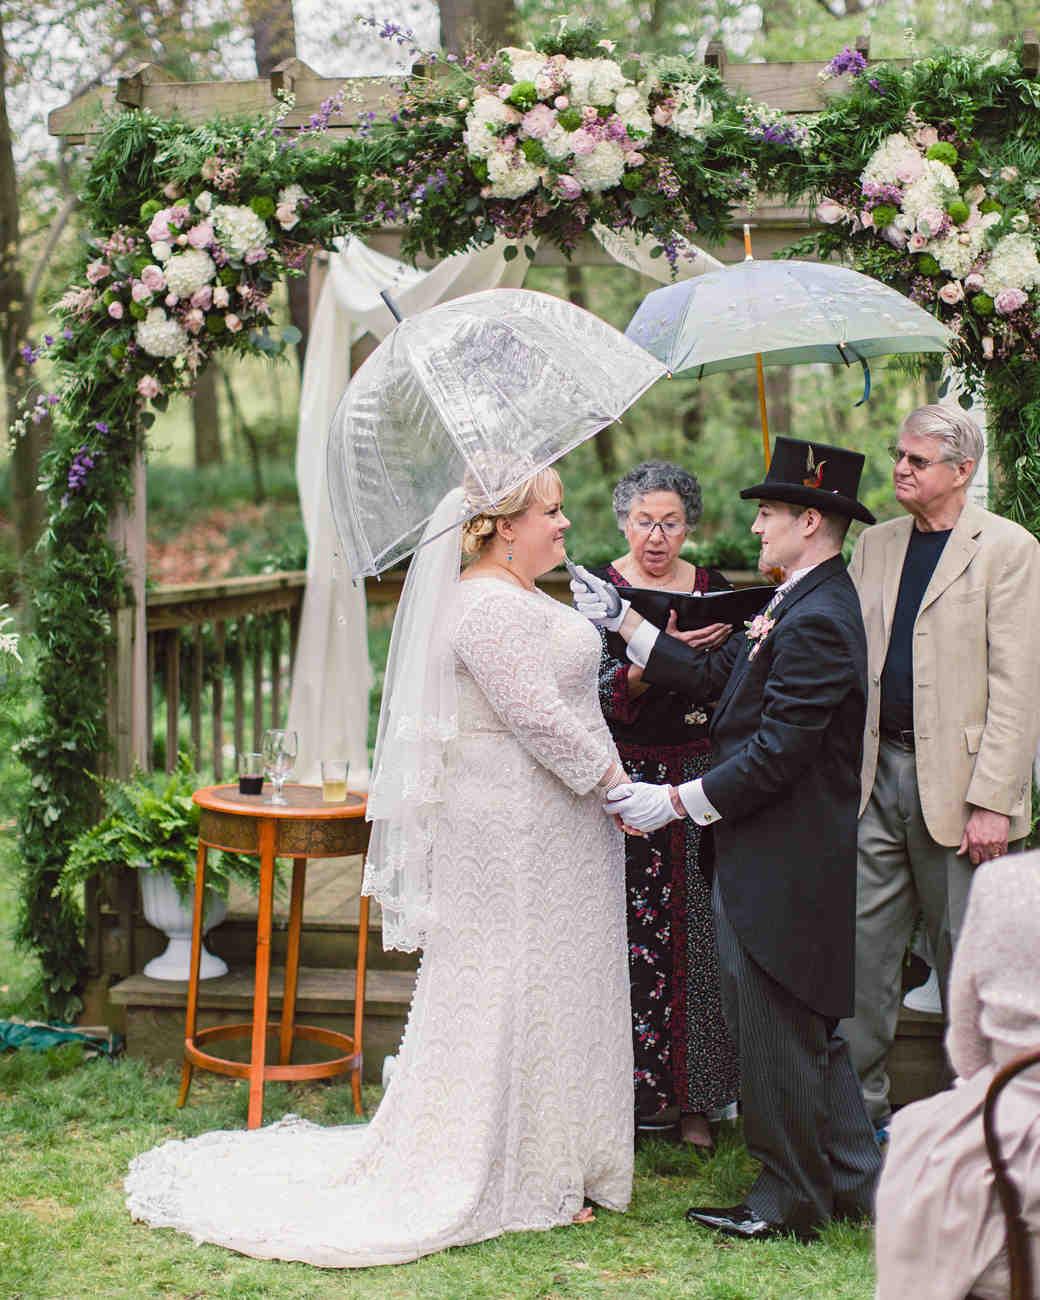 10 Times Rain Made A Wedding Even More Special